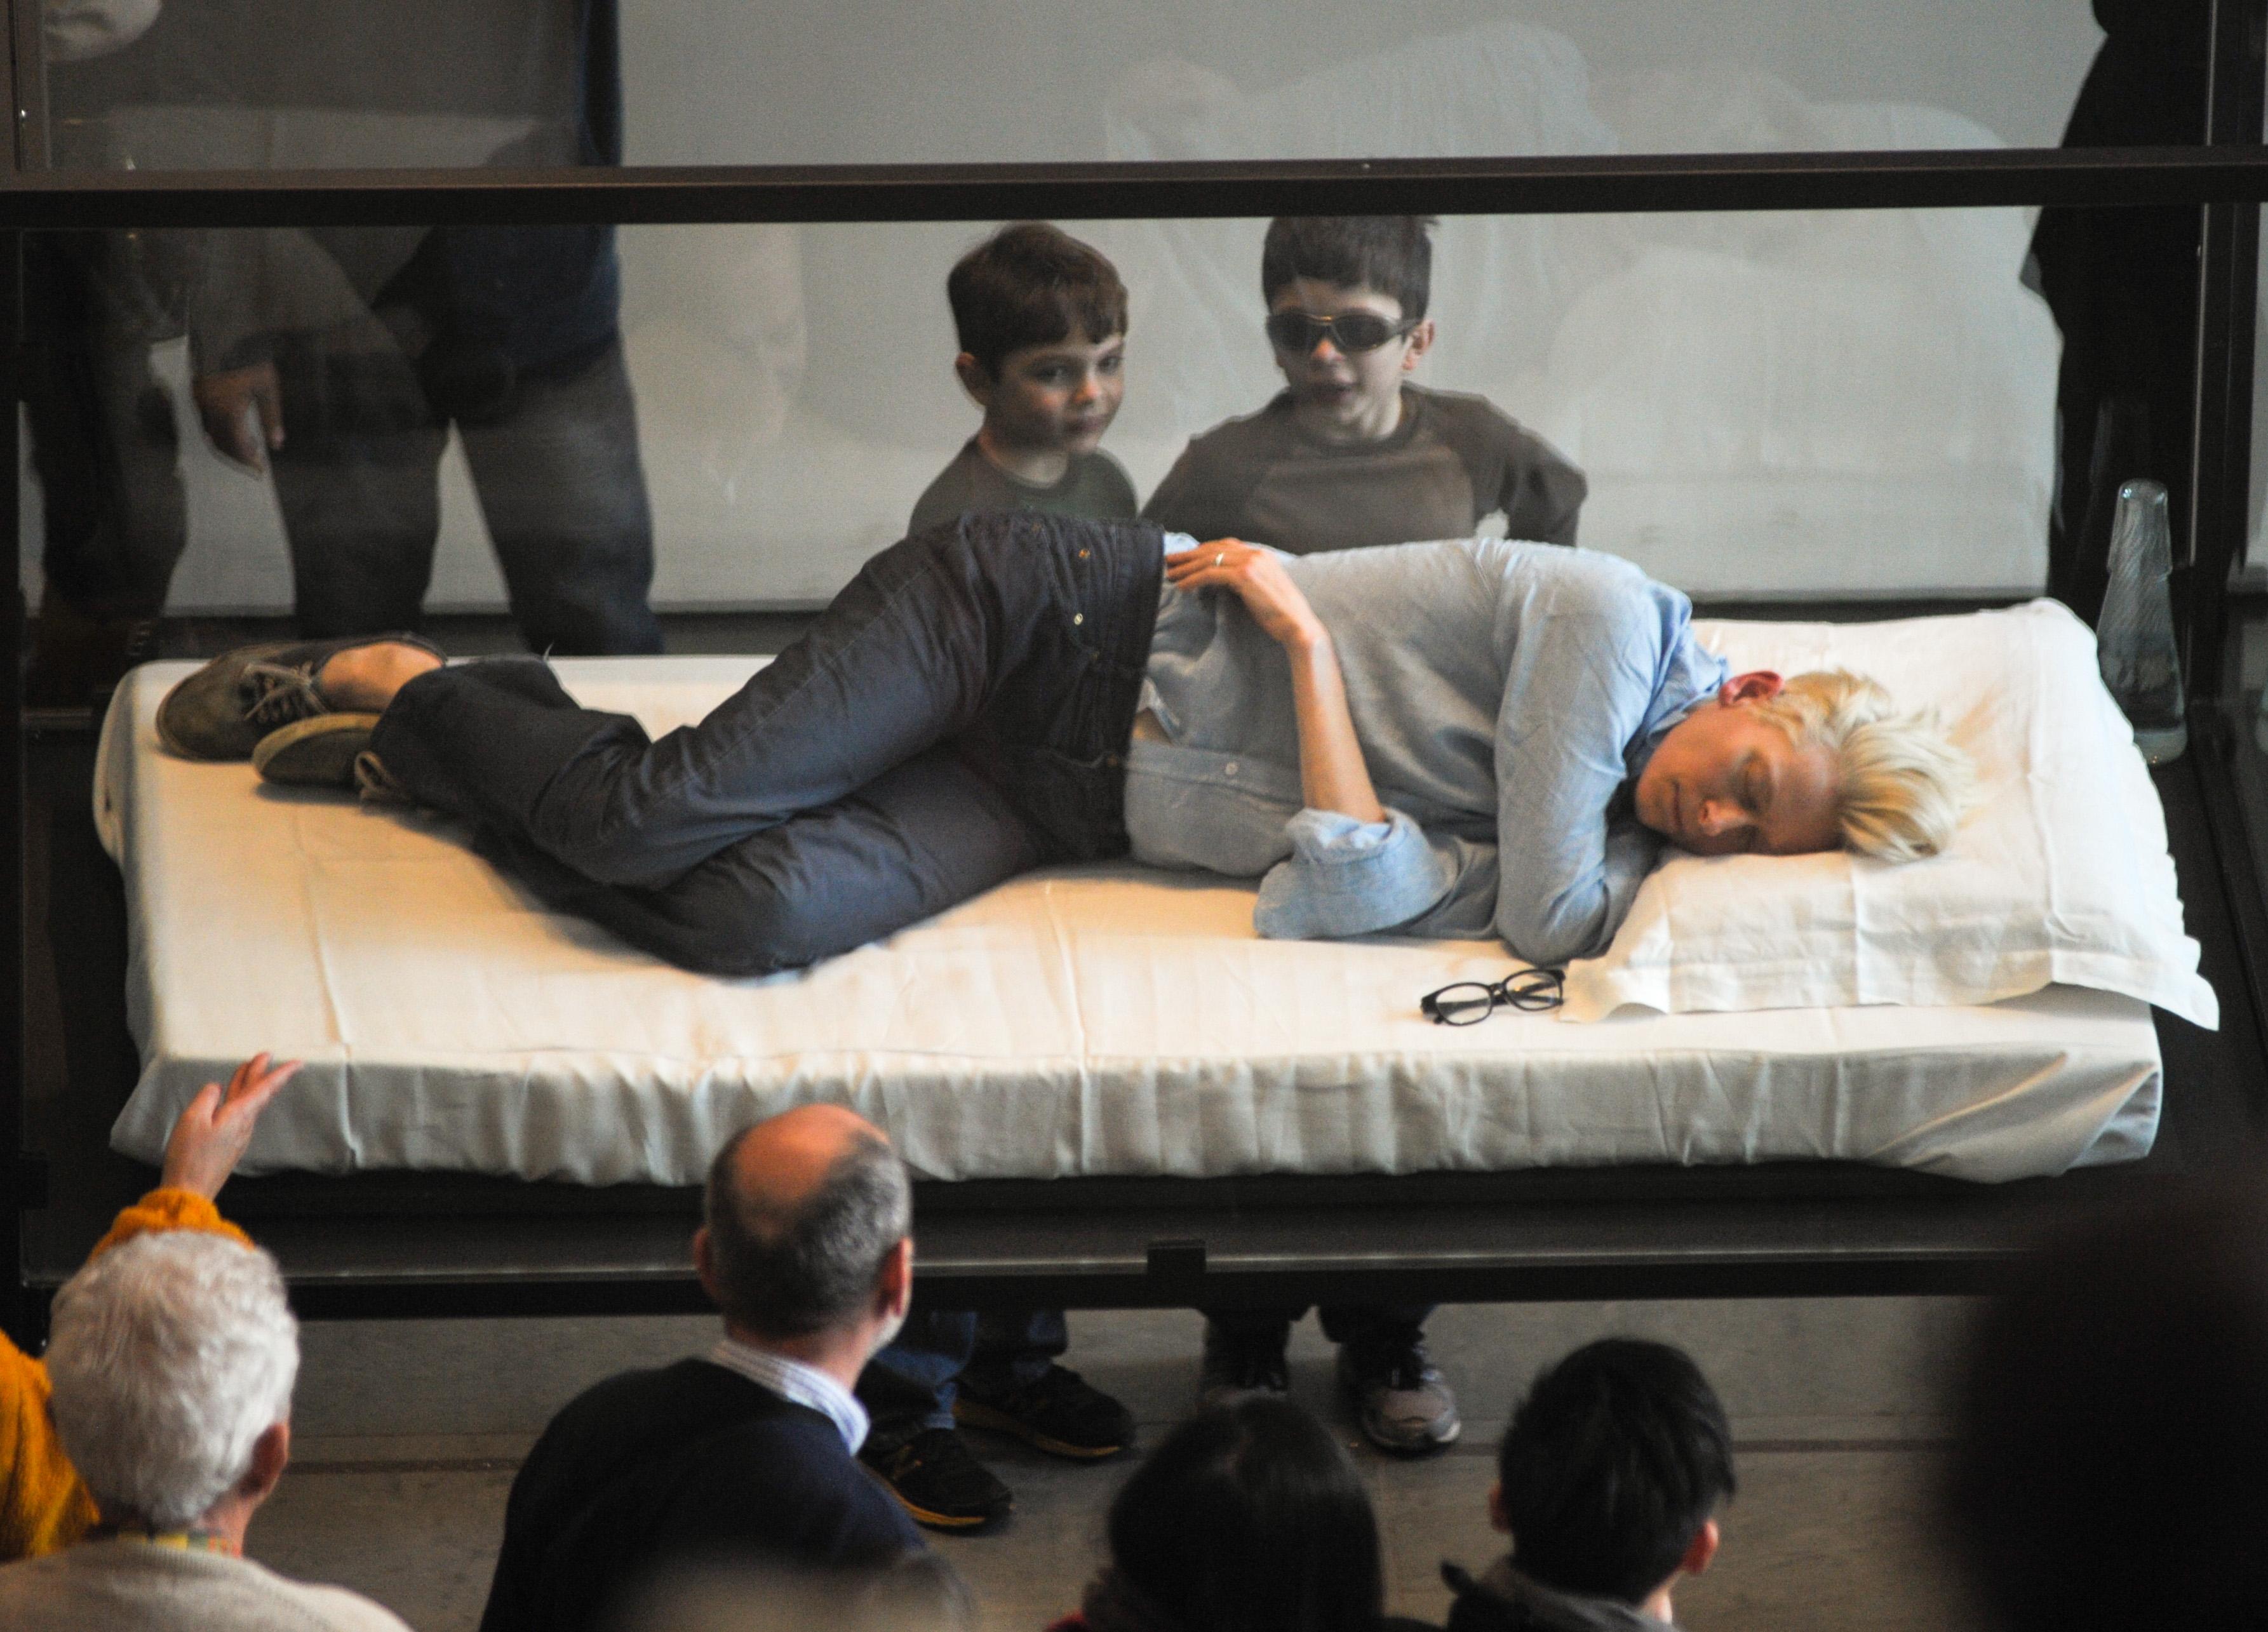 Tilda Swinton sleeps in glass box for Museum of Modern Art exhibit